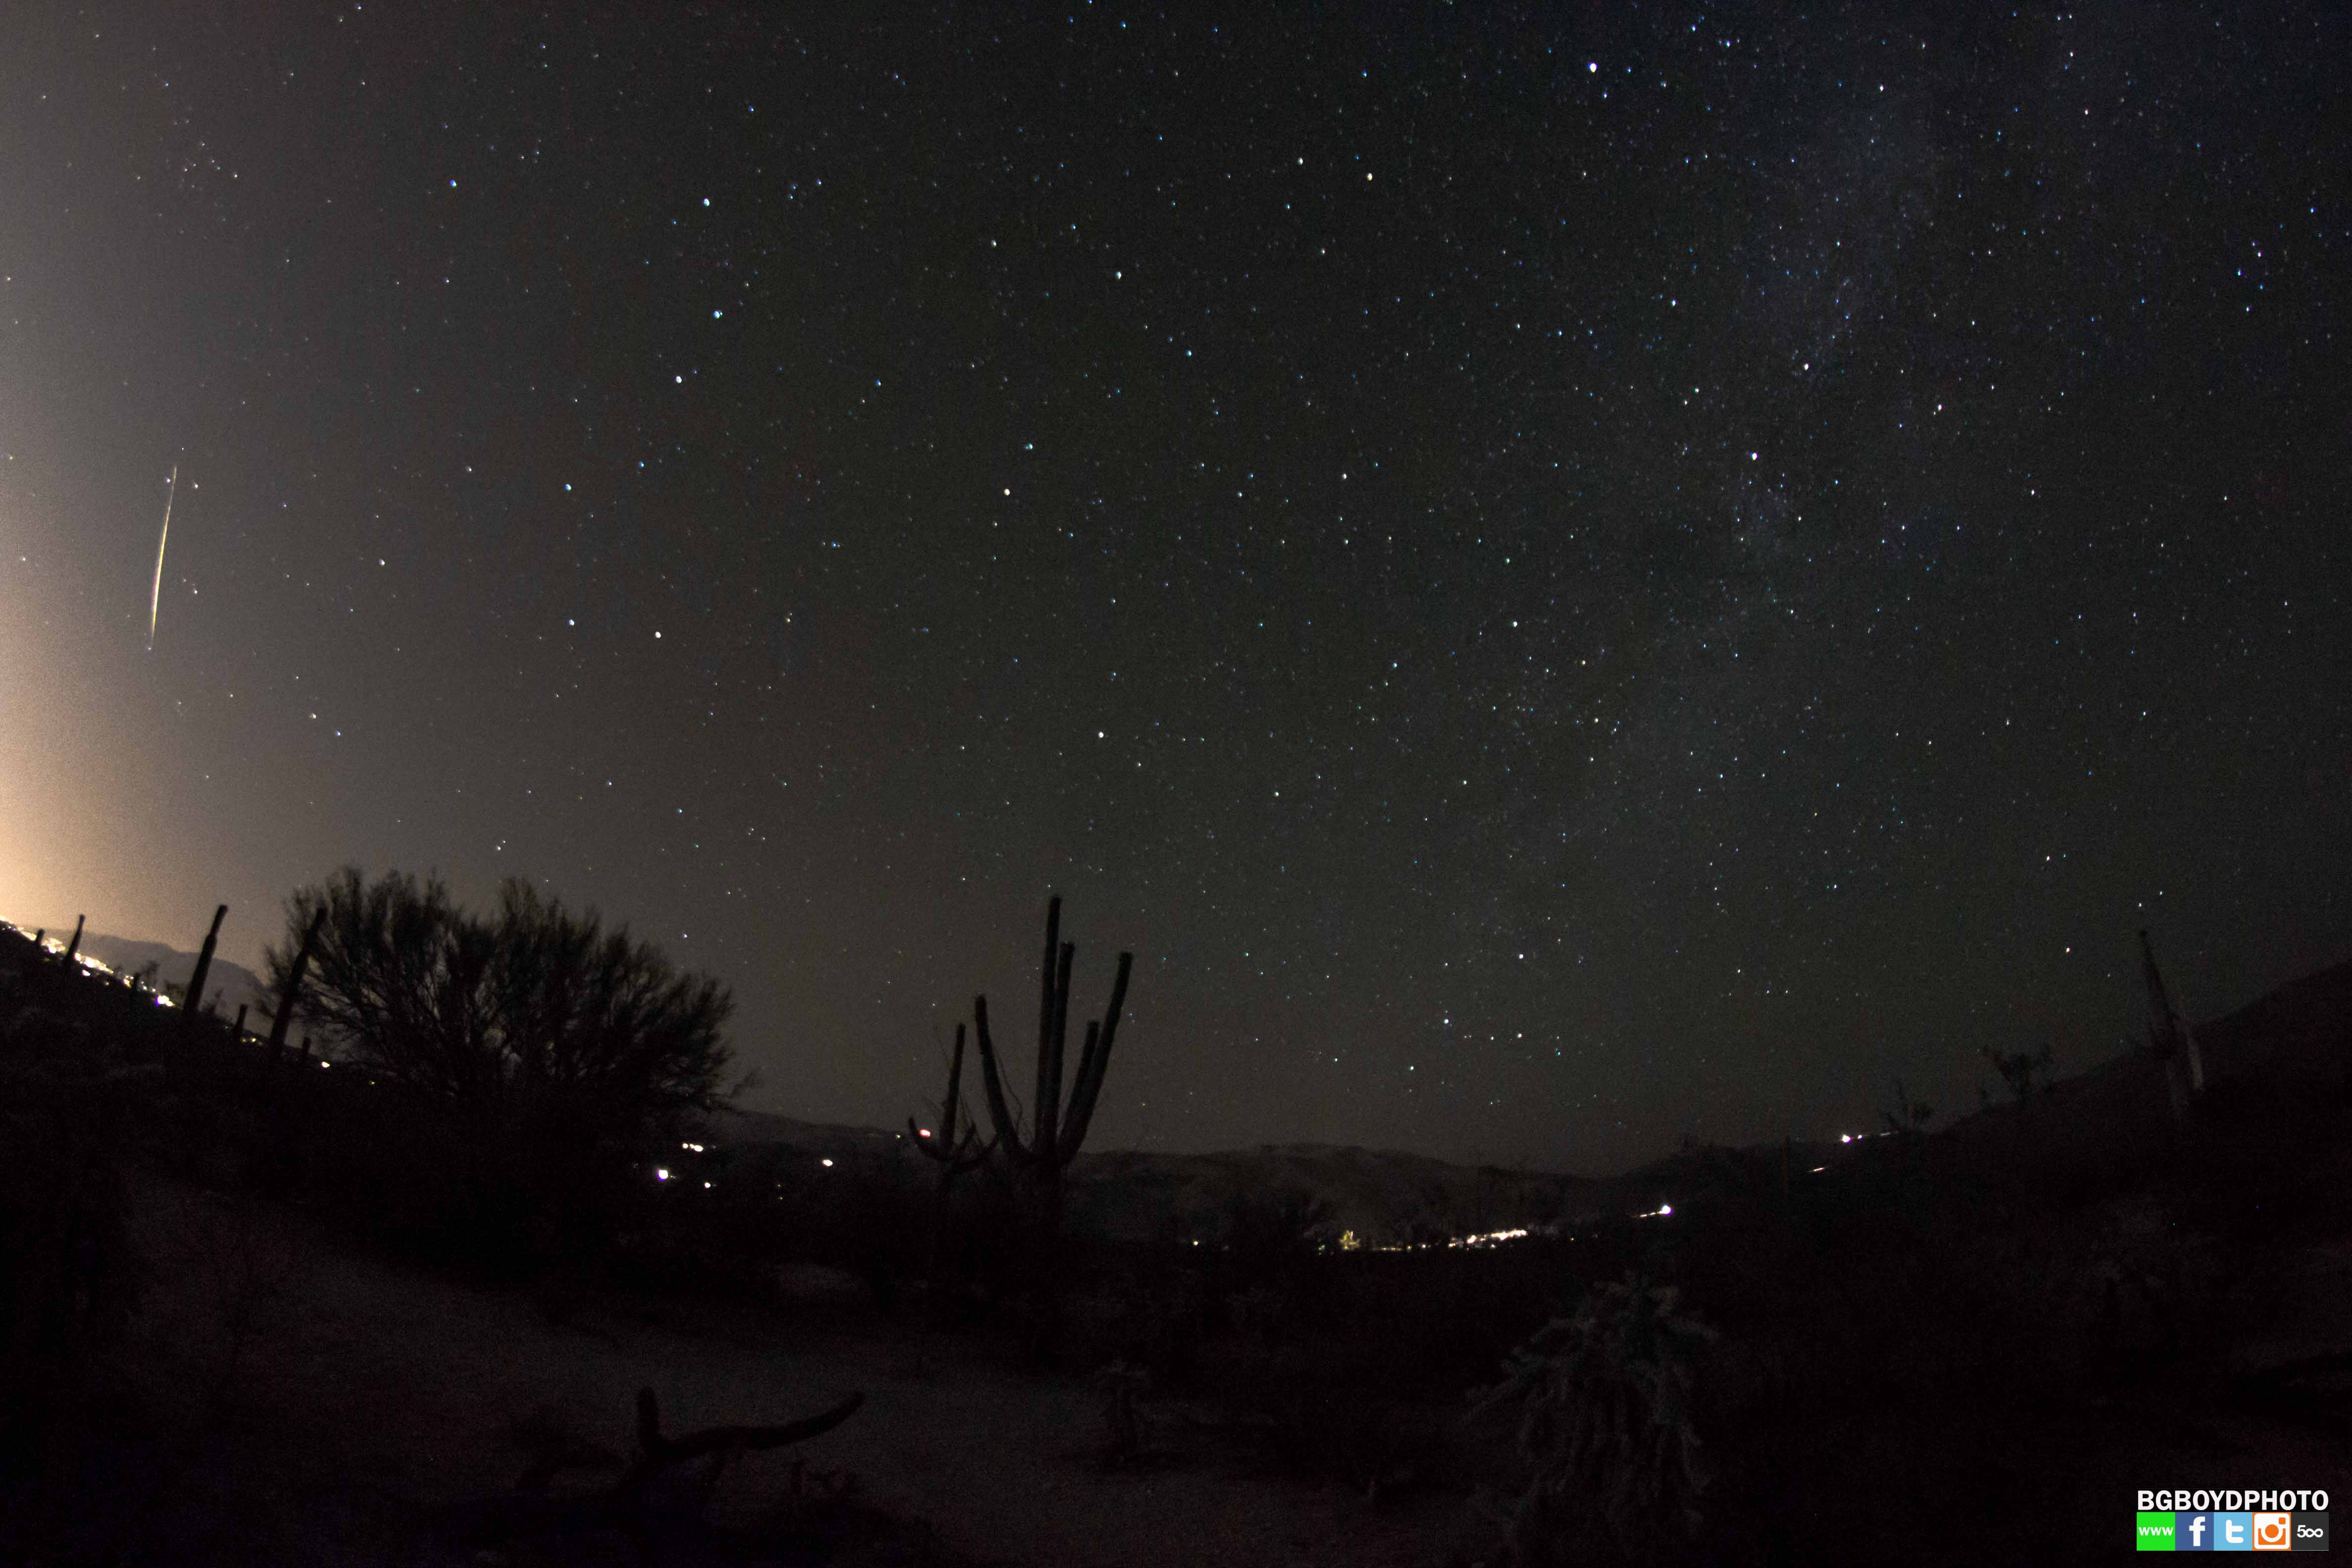 Camelopardalid Meteor Over Tucson: BG Boyd